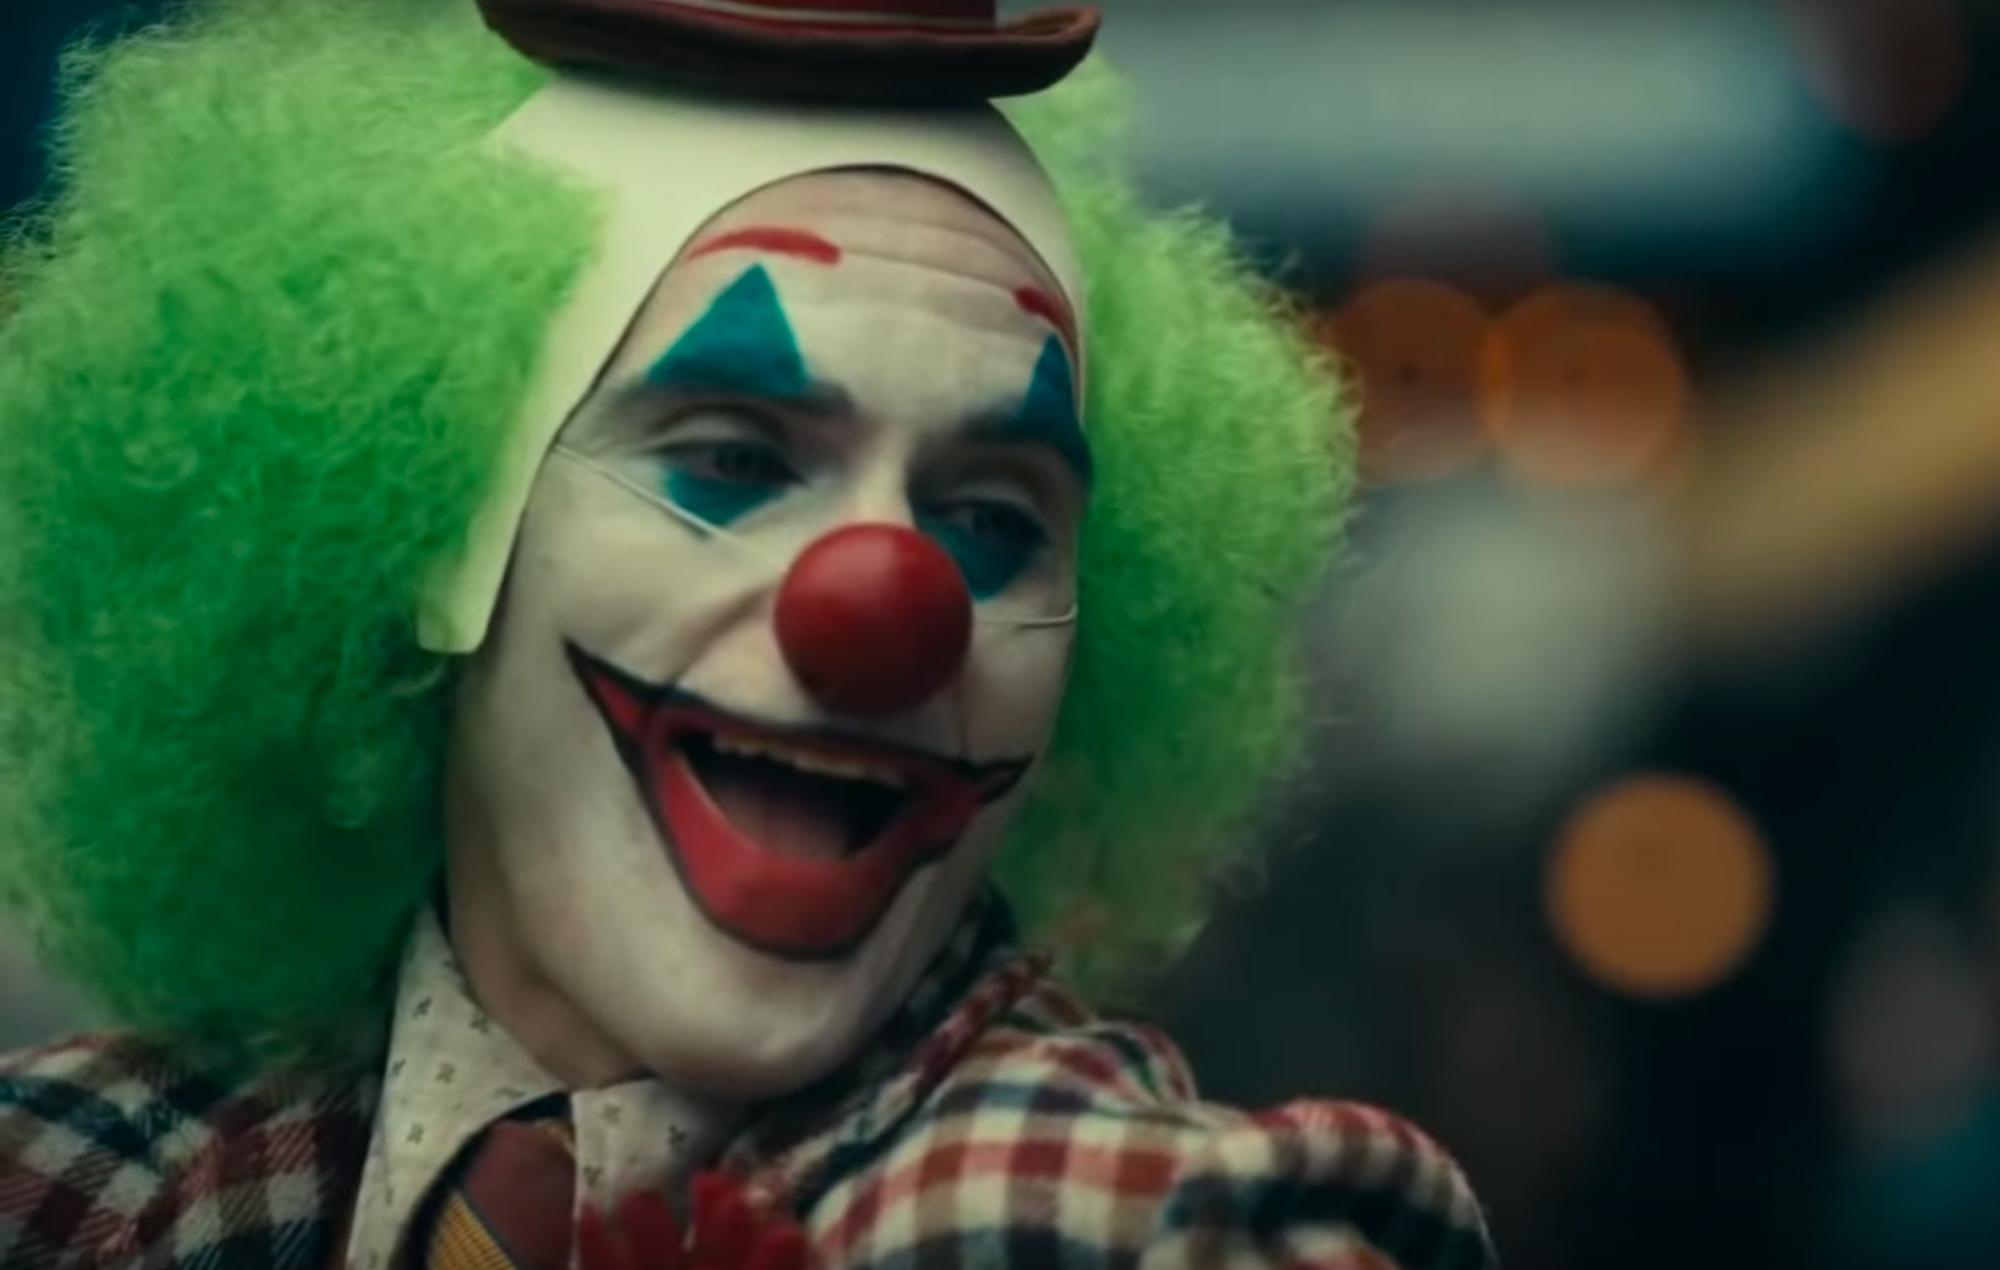 'Joker' director Todd Phillips confirms 1960s 'Batman' Easter egg